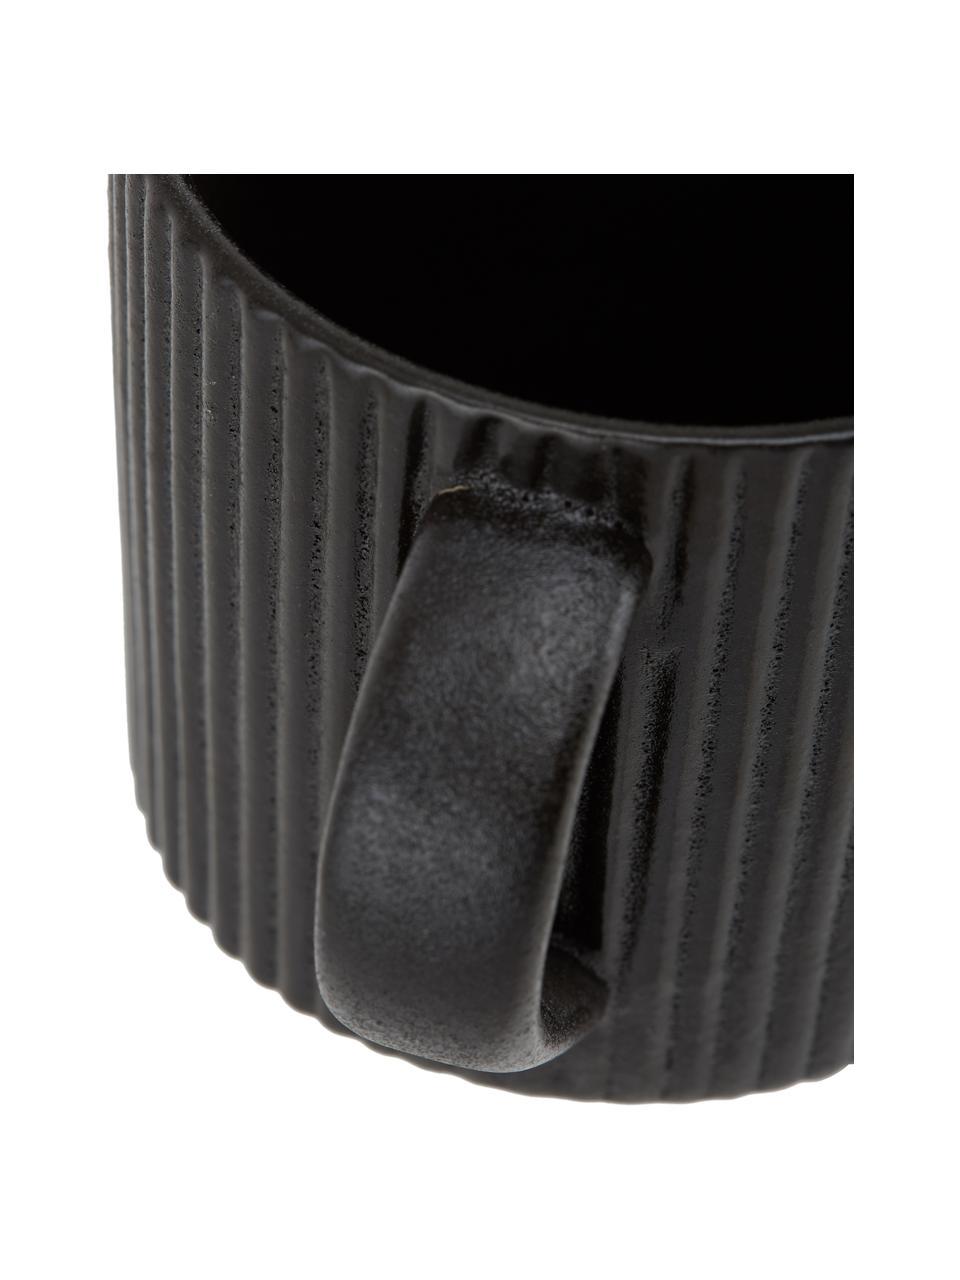 Tazza nera opaca con struttura rigata Neri 2 pz, Terracotta Con una struttura scanalata e una superficie leggermente ruvida, Nero, Ø 9 x Alt. 9 cm